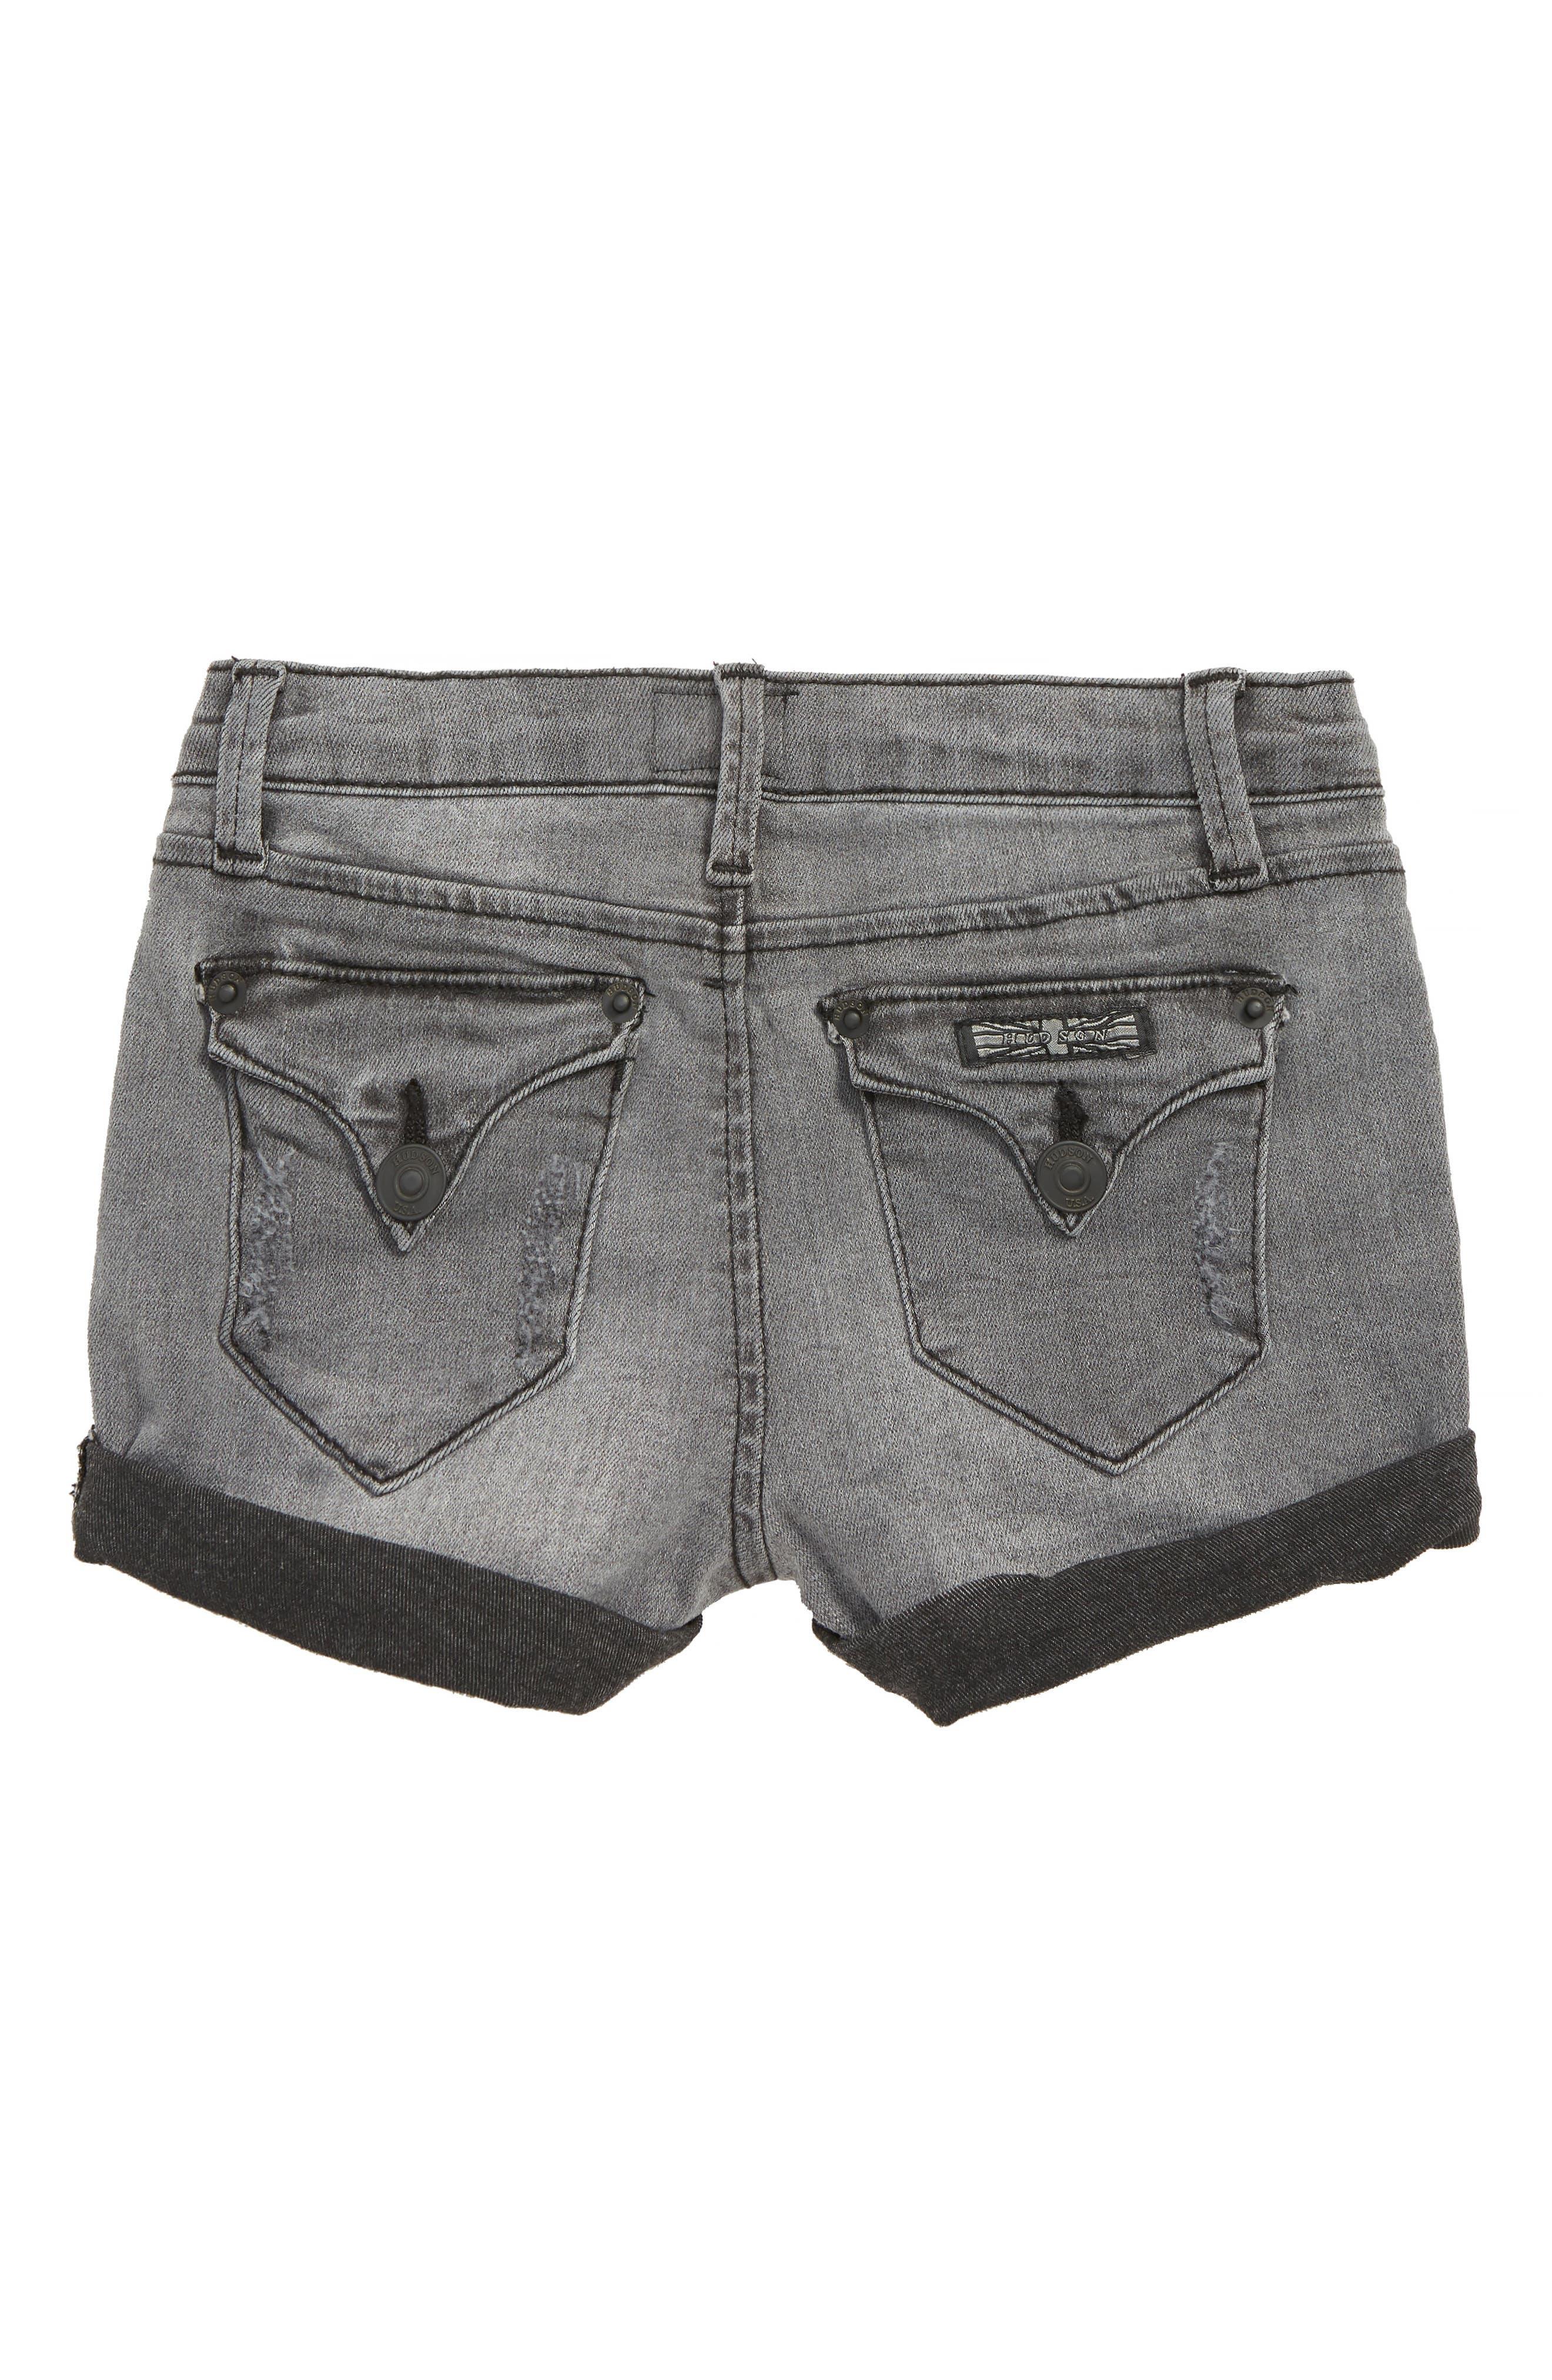 Roll Cuff Denim Shorts,                             Alternate thumbnail 2, color,                             001